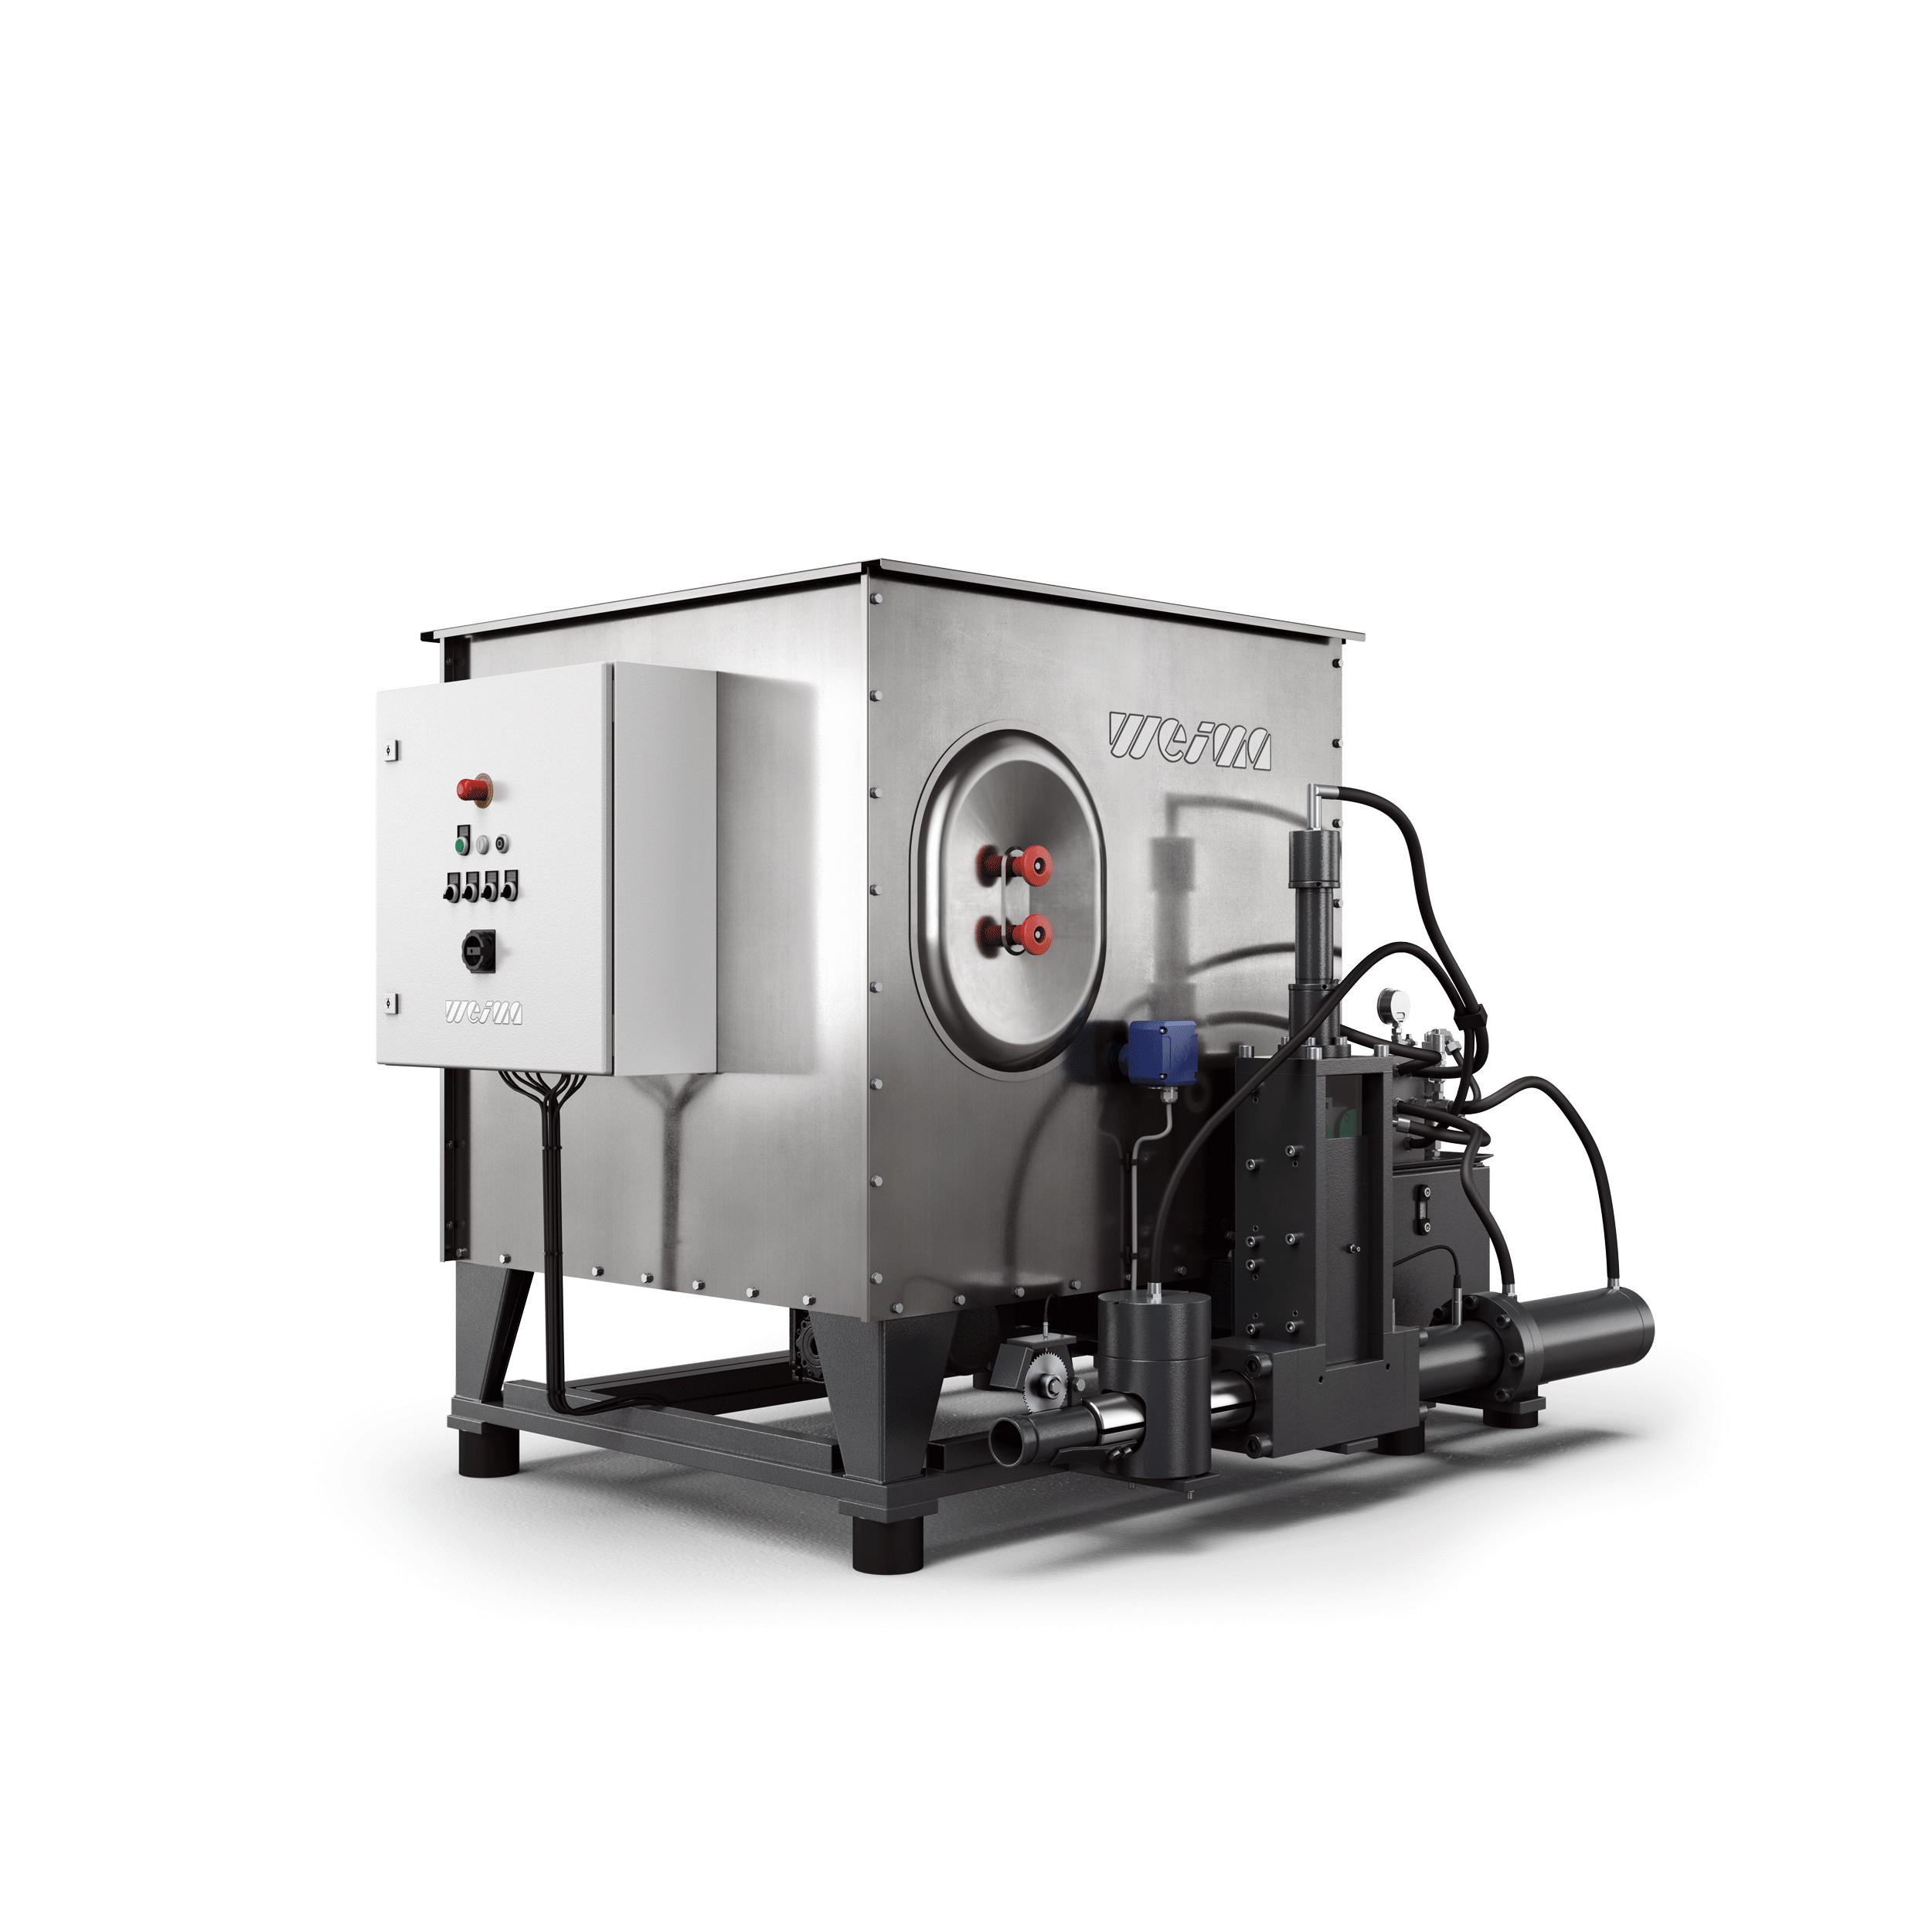 WEIMA C 140 briquette press